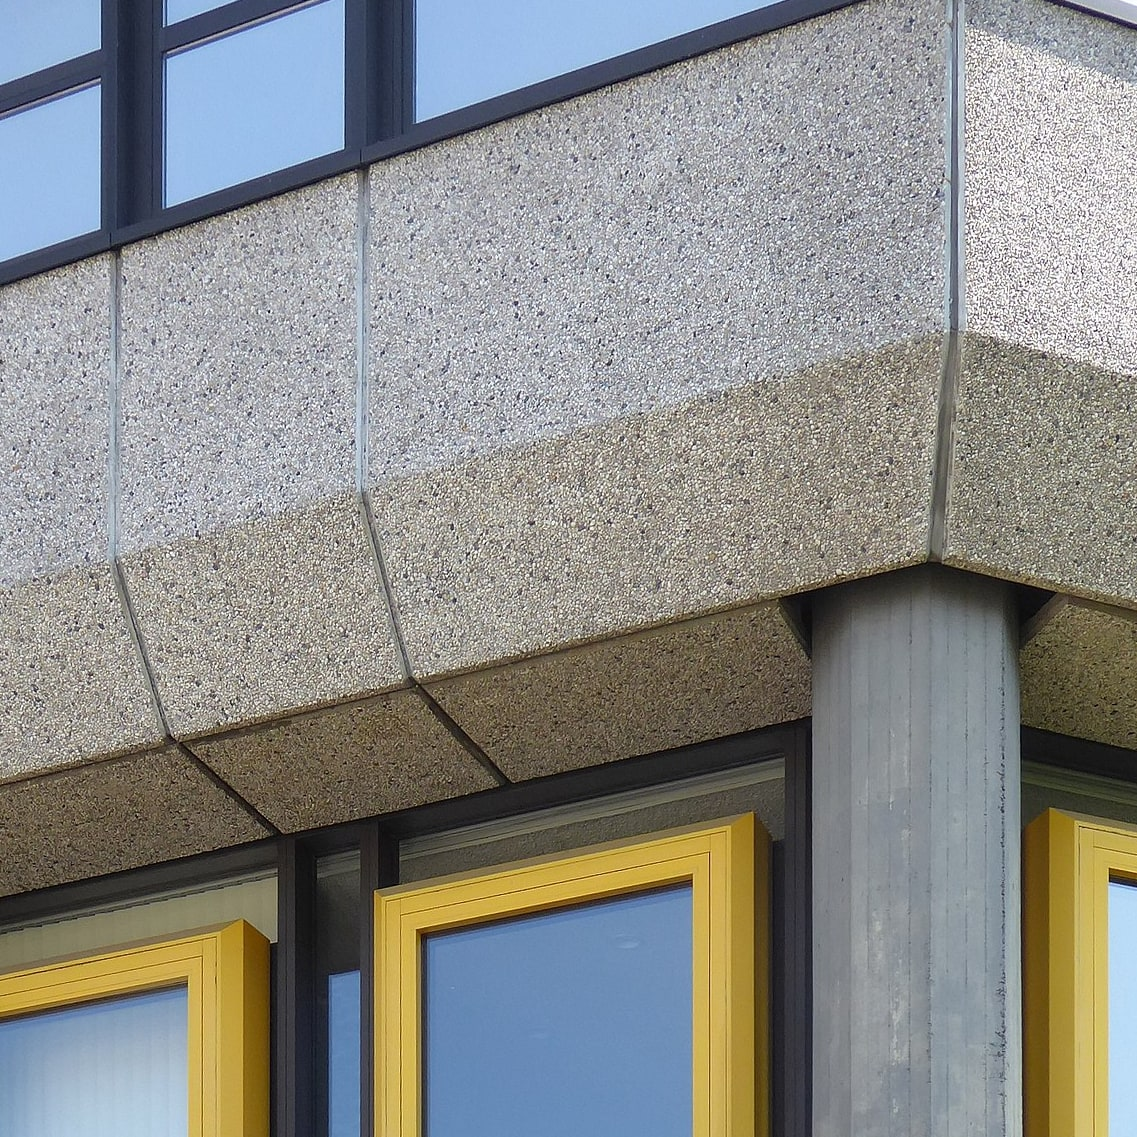 Neues Projekt Rathaus Goettingen